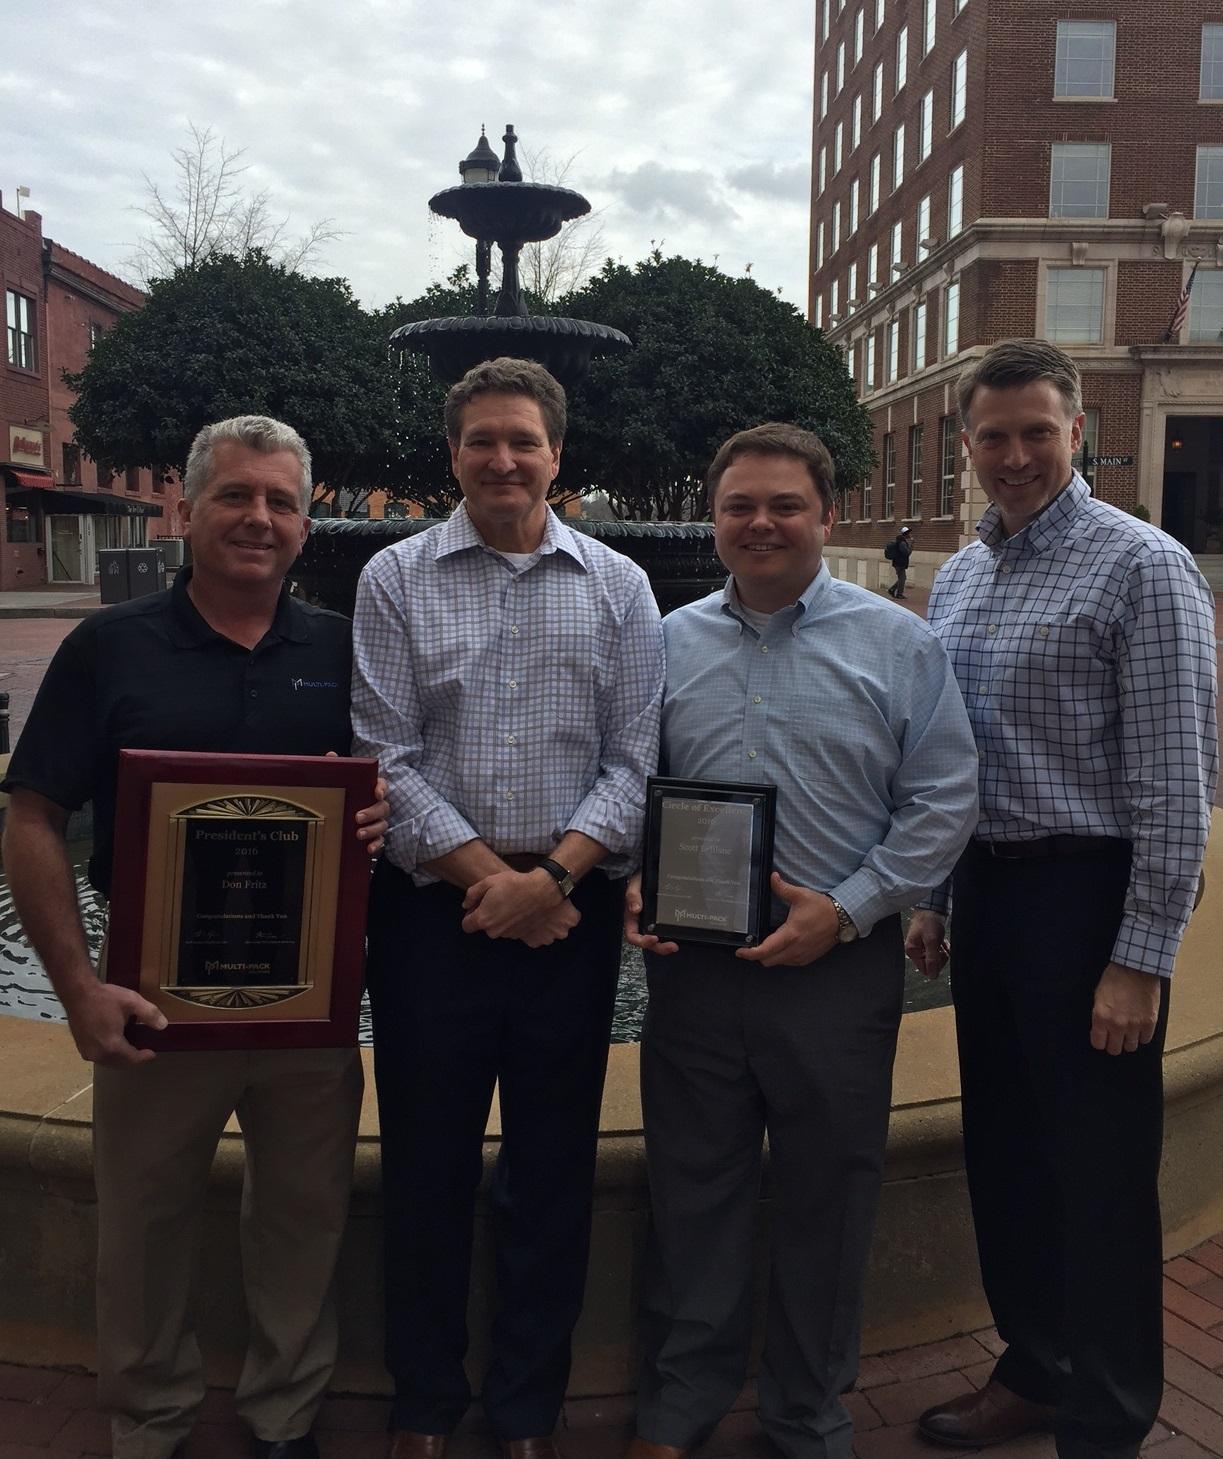 2016 Sales Award Winners Announced